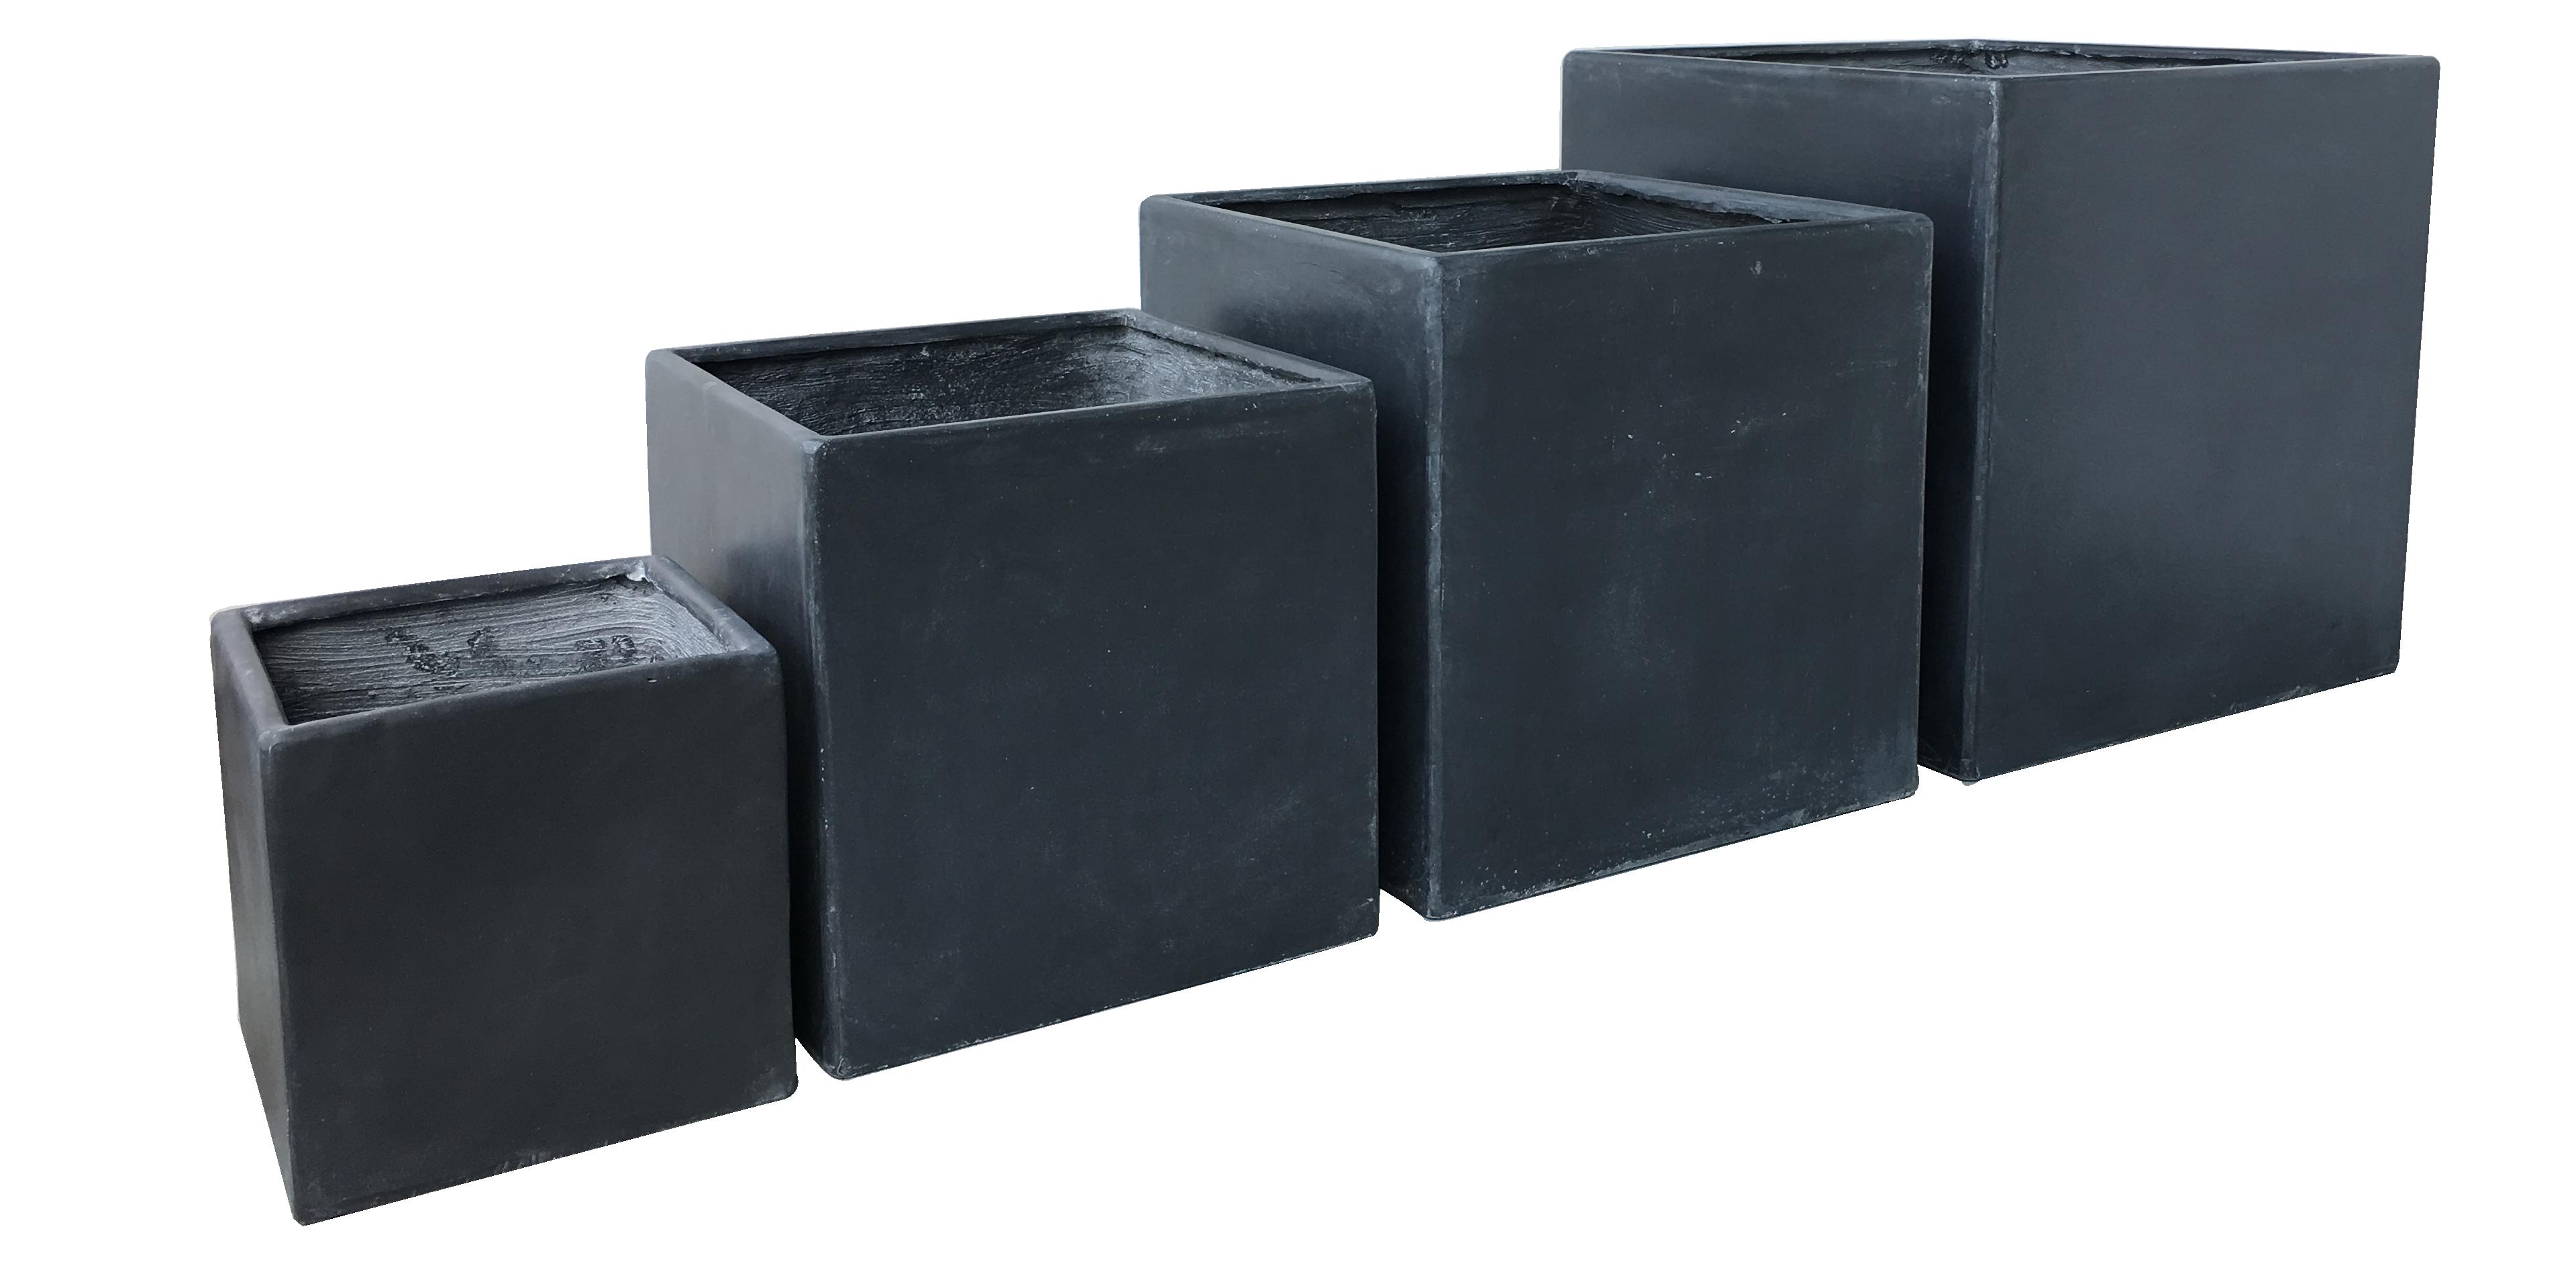 exklusiv & hochwertig - premium pflanzkübel set - lounge cube pot